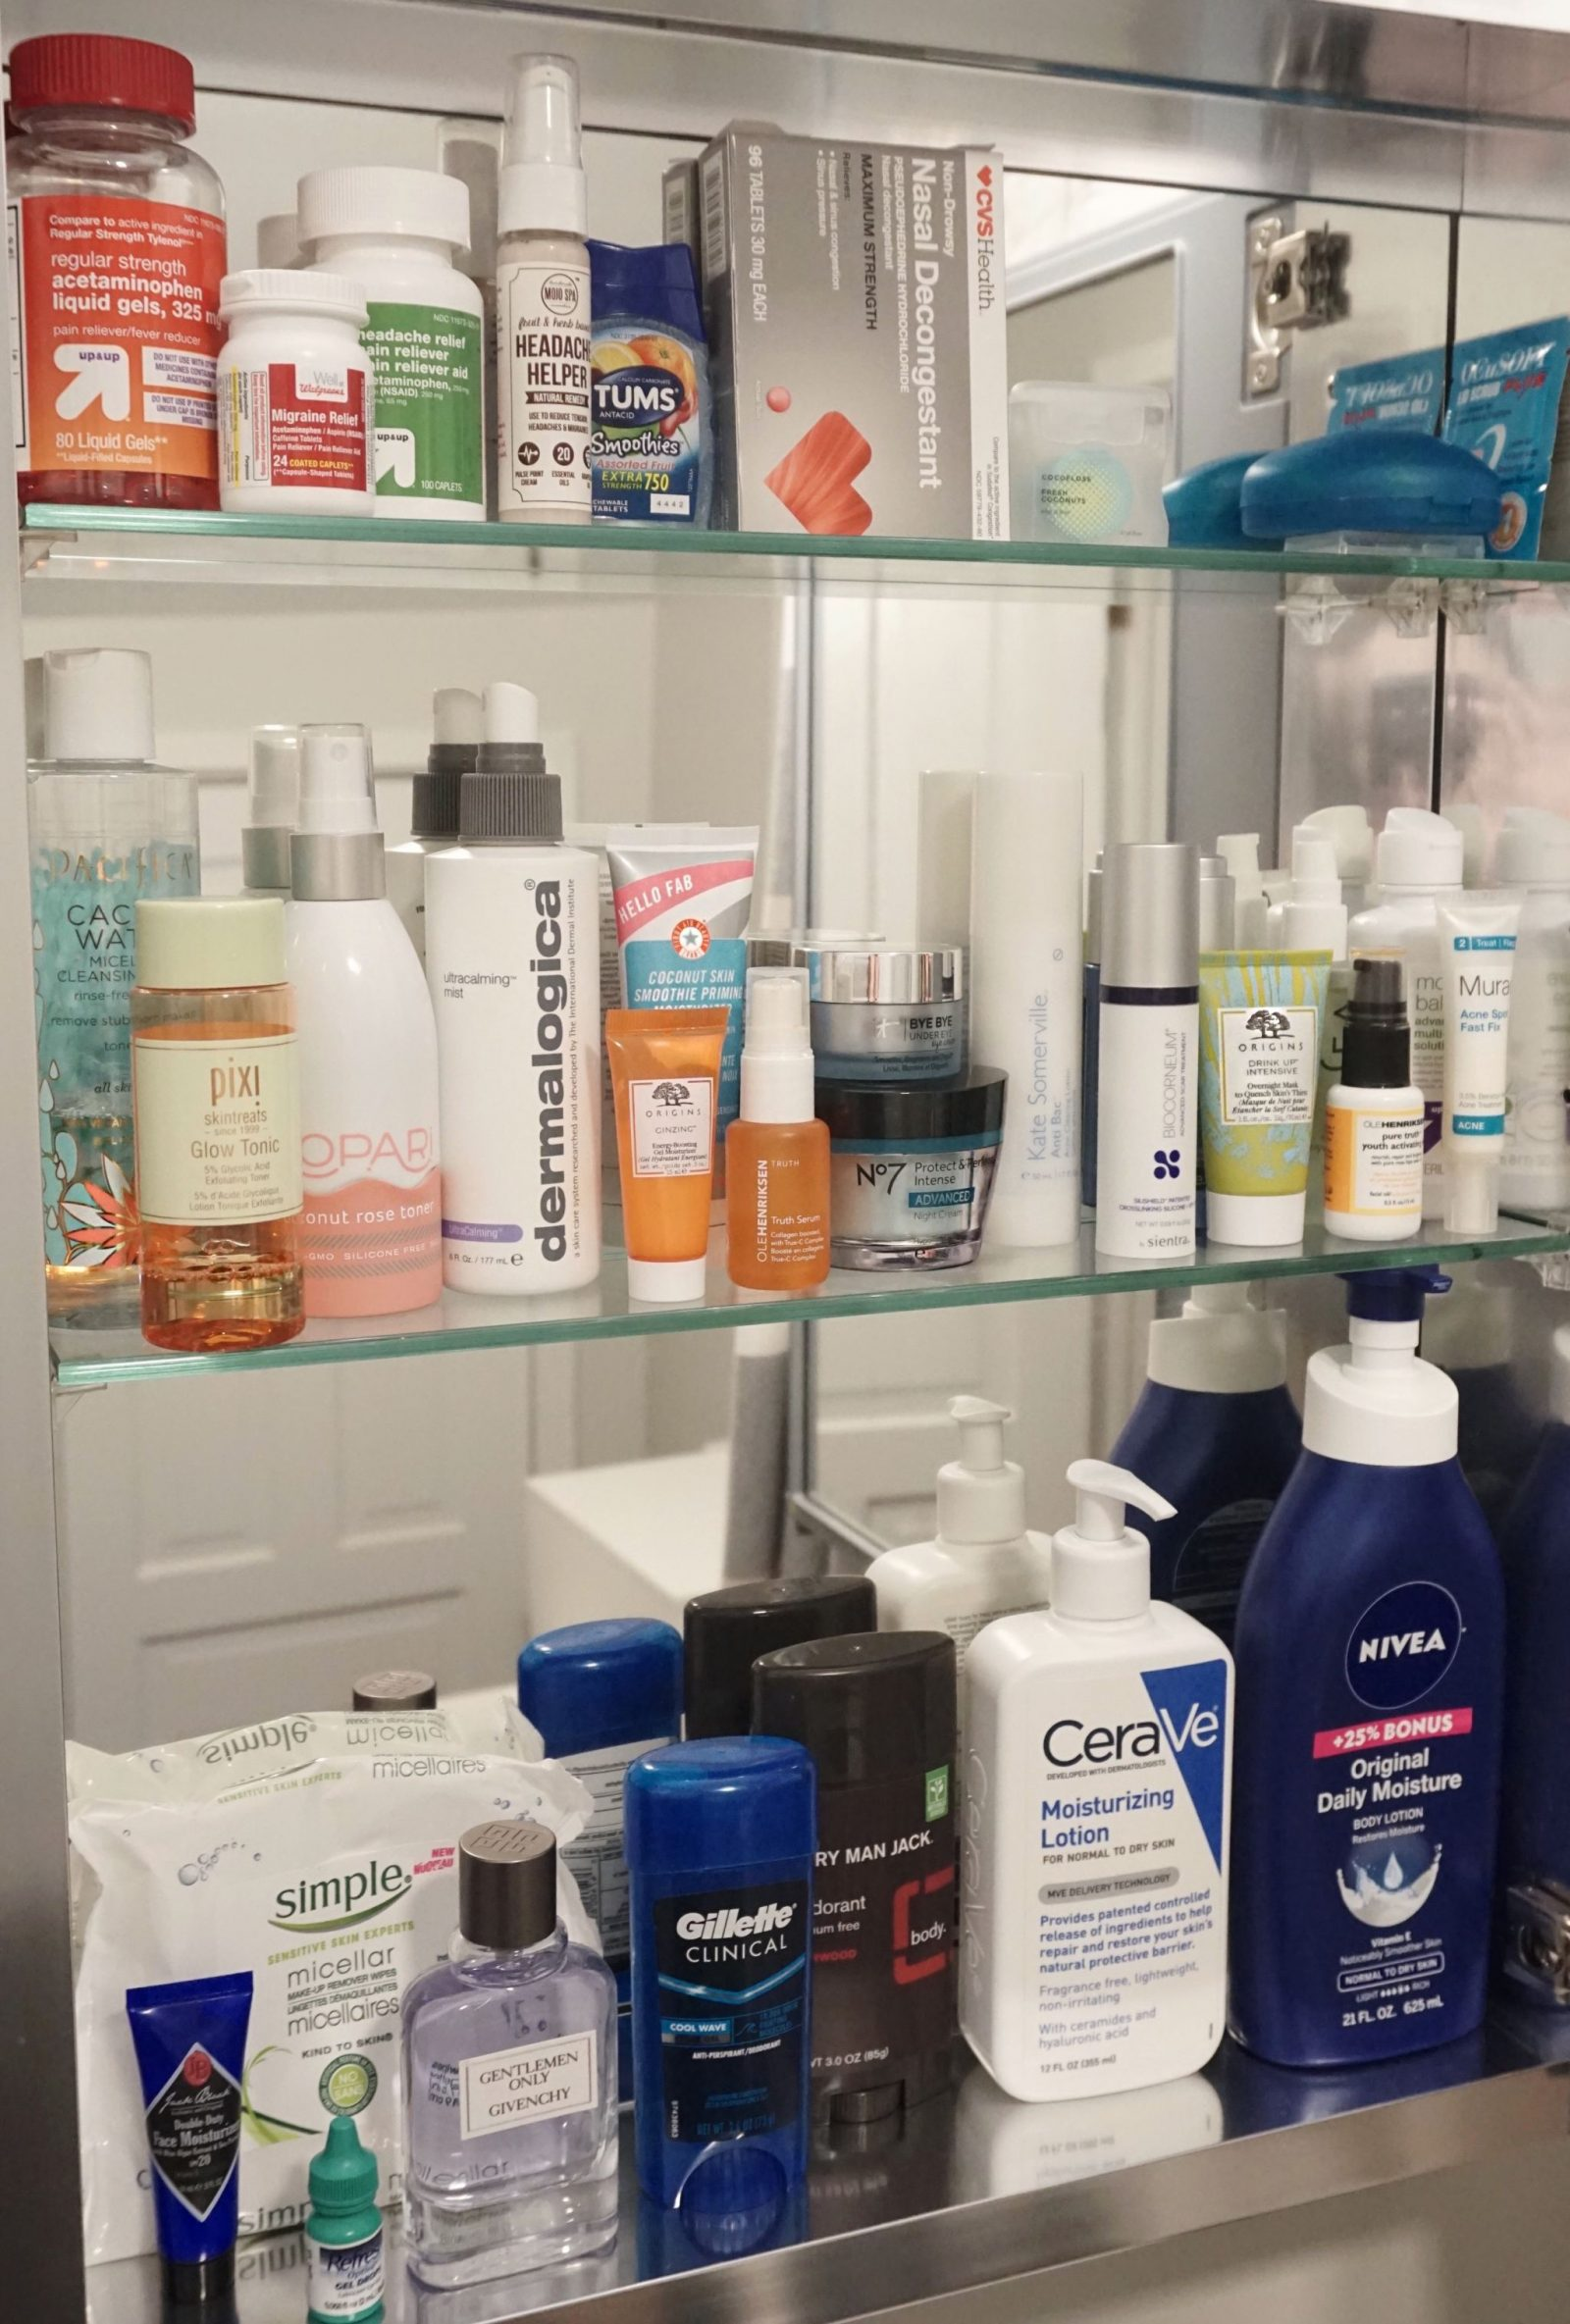 His & Hers Medicine Cabinet Essentials